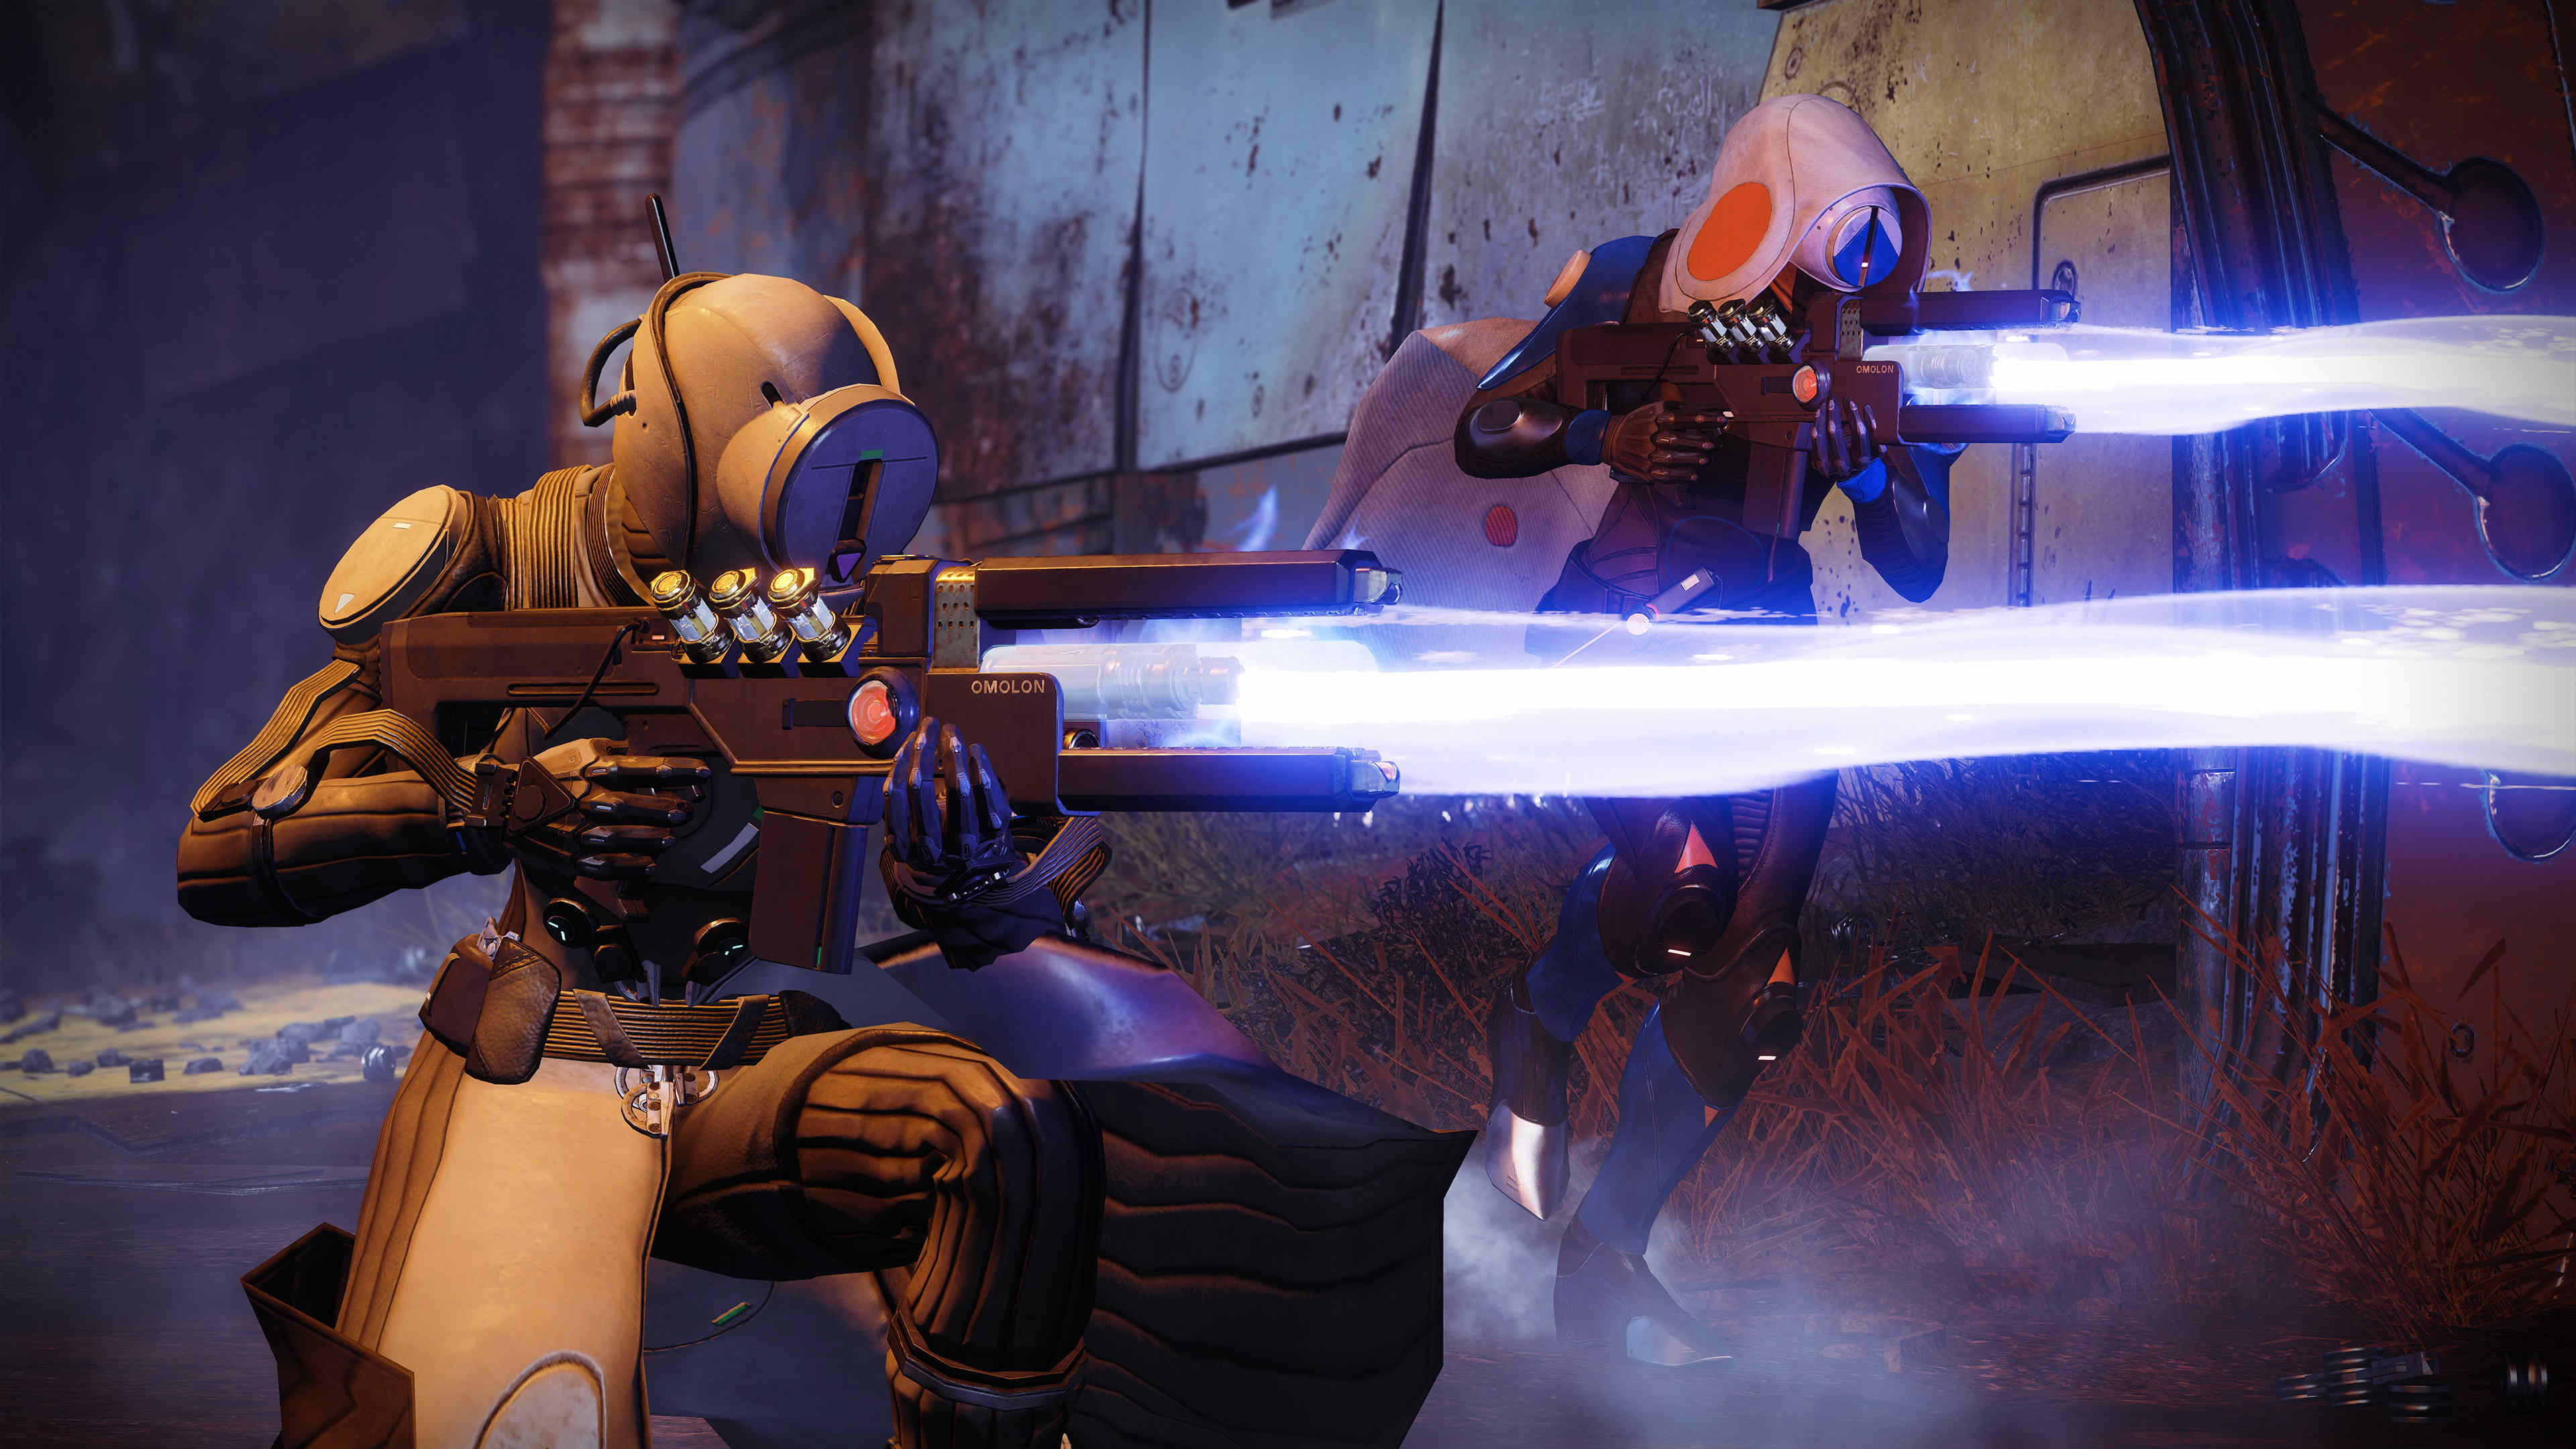 Destiny 2 Forsaken Raid Glitches Allow Immediate Access To Last Wish Raid Gear Shacknews